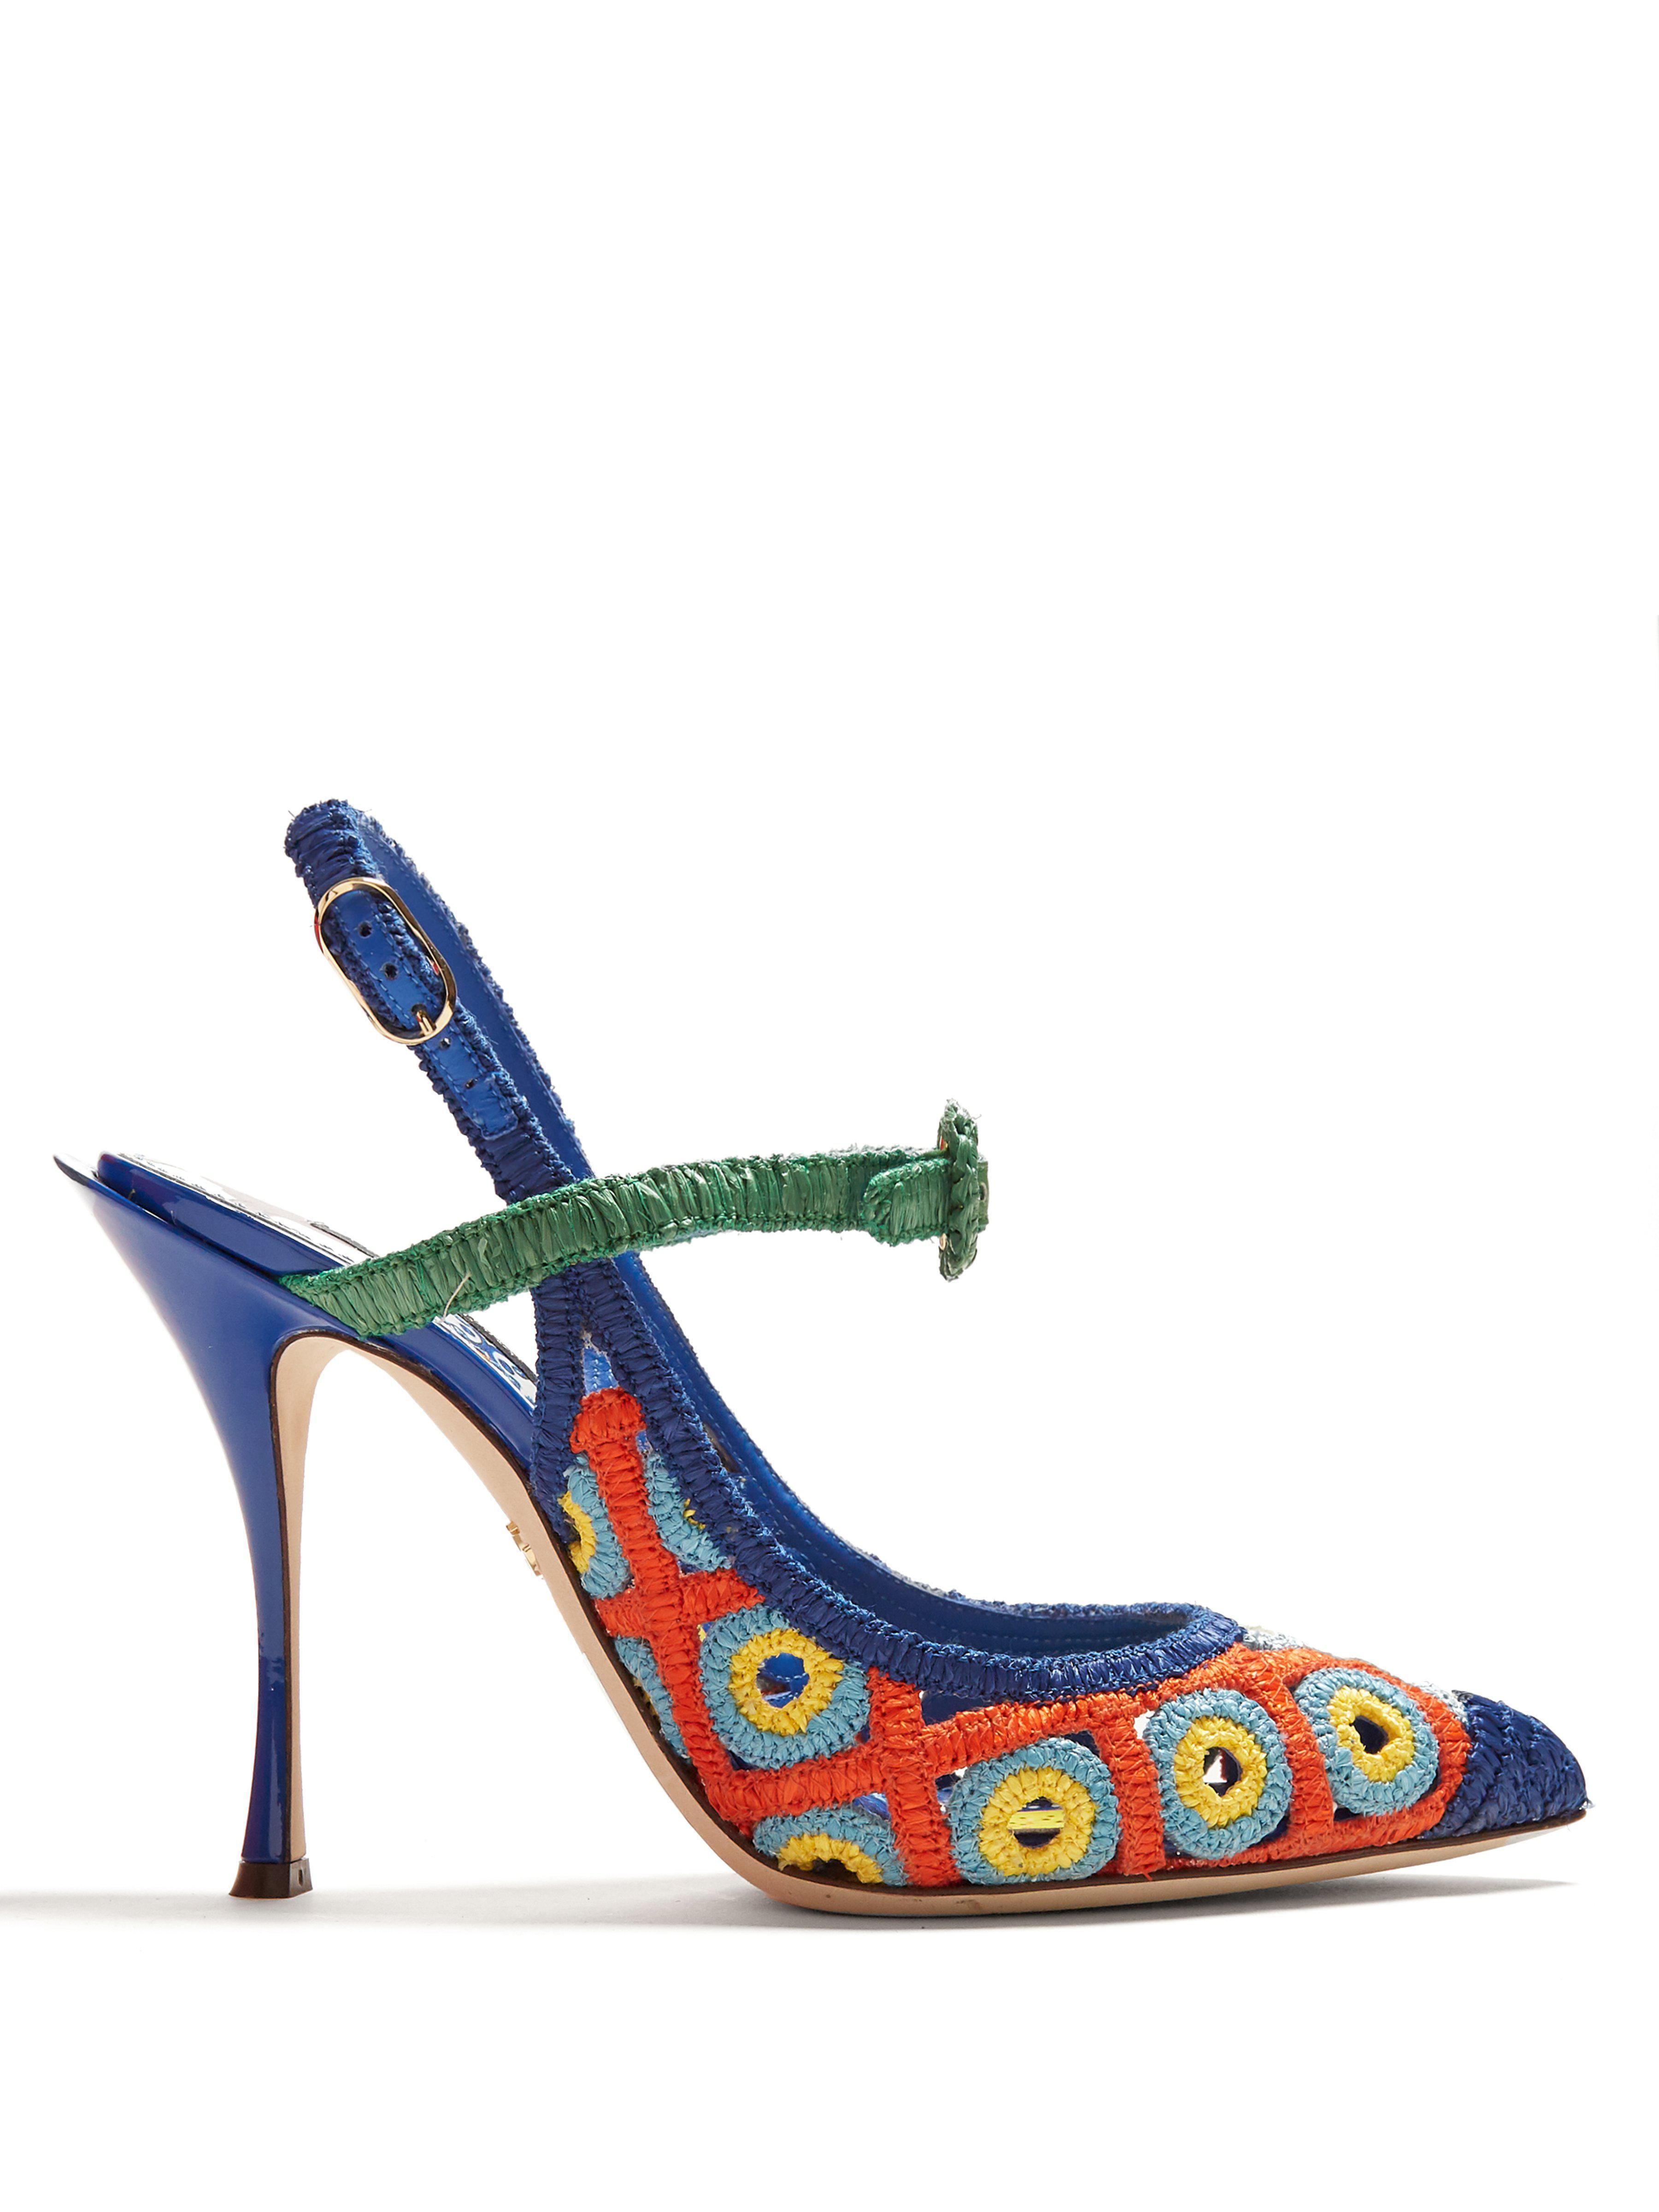 7edc2fc9e41 Dolce   Gabbana Majolica Woven Wicker Slingback Pumps in Blue - Lyst